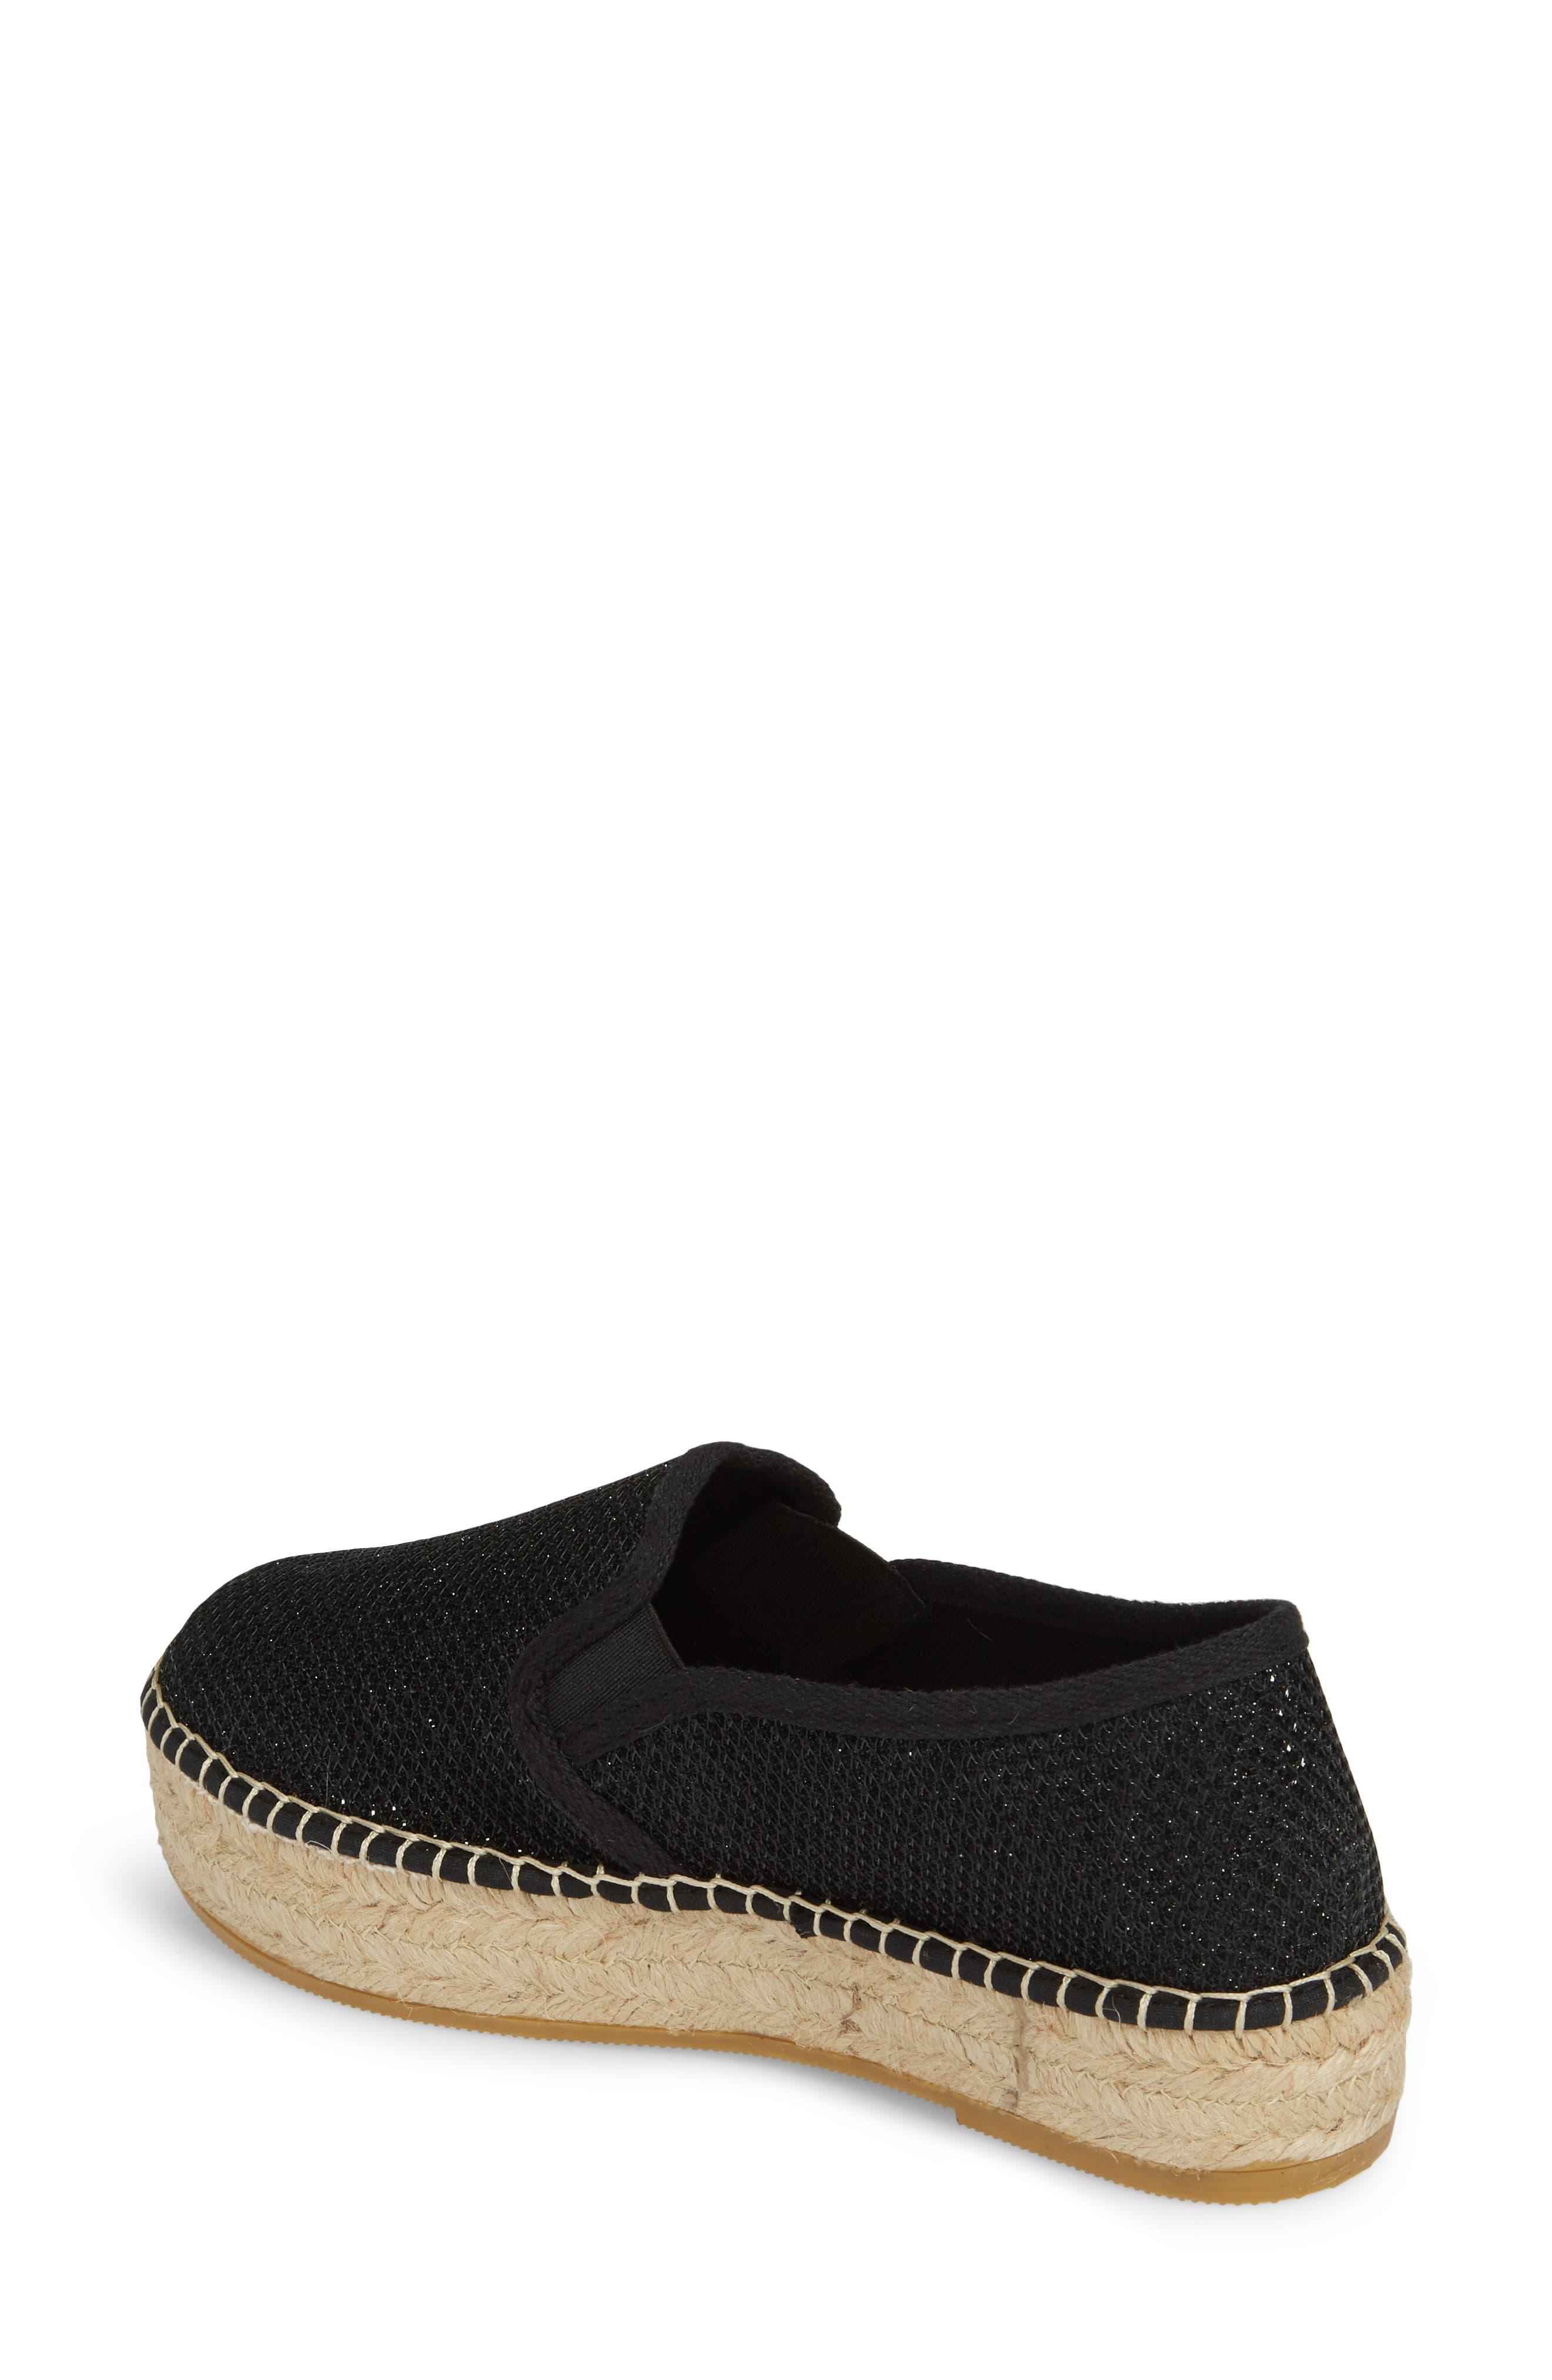 Fonda Platform Espadrille Sneaker,                             Alternate thumbnail 2, color,                             BLACK FABRIC